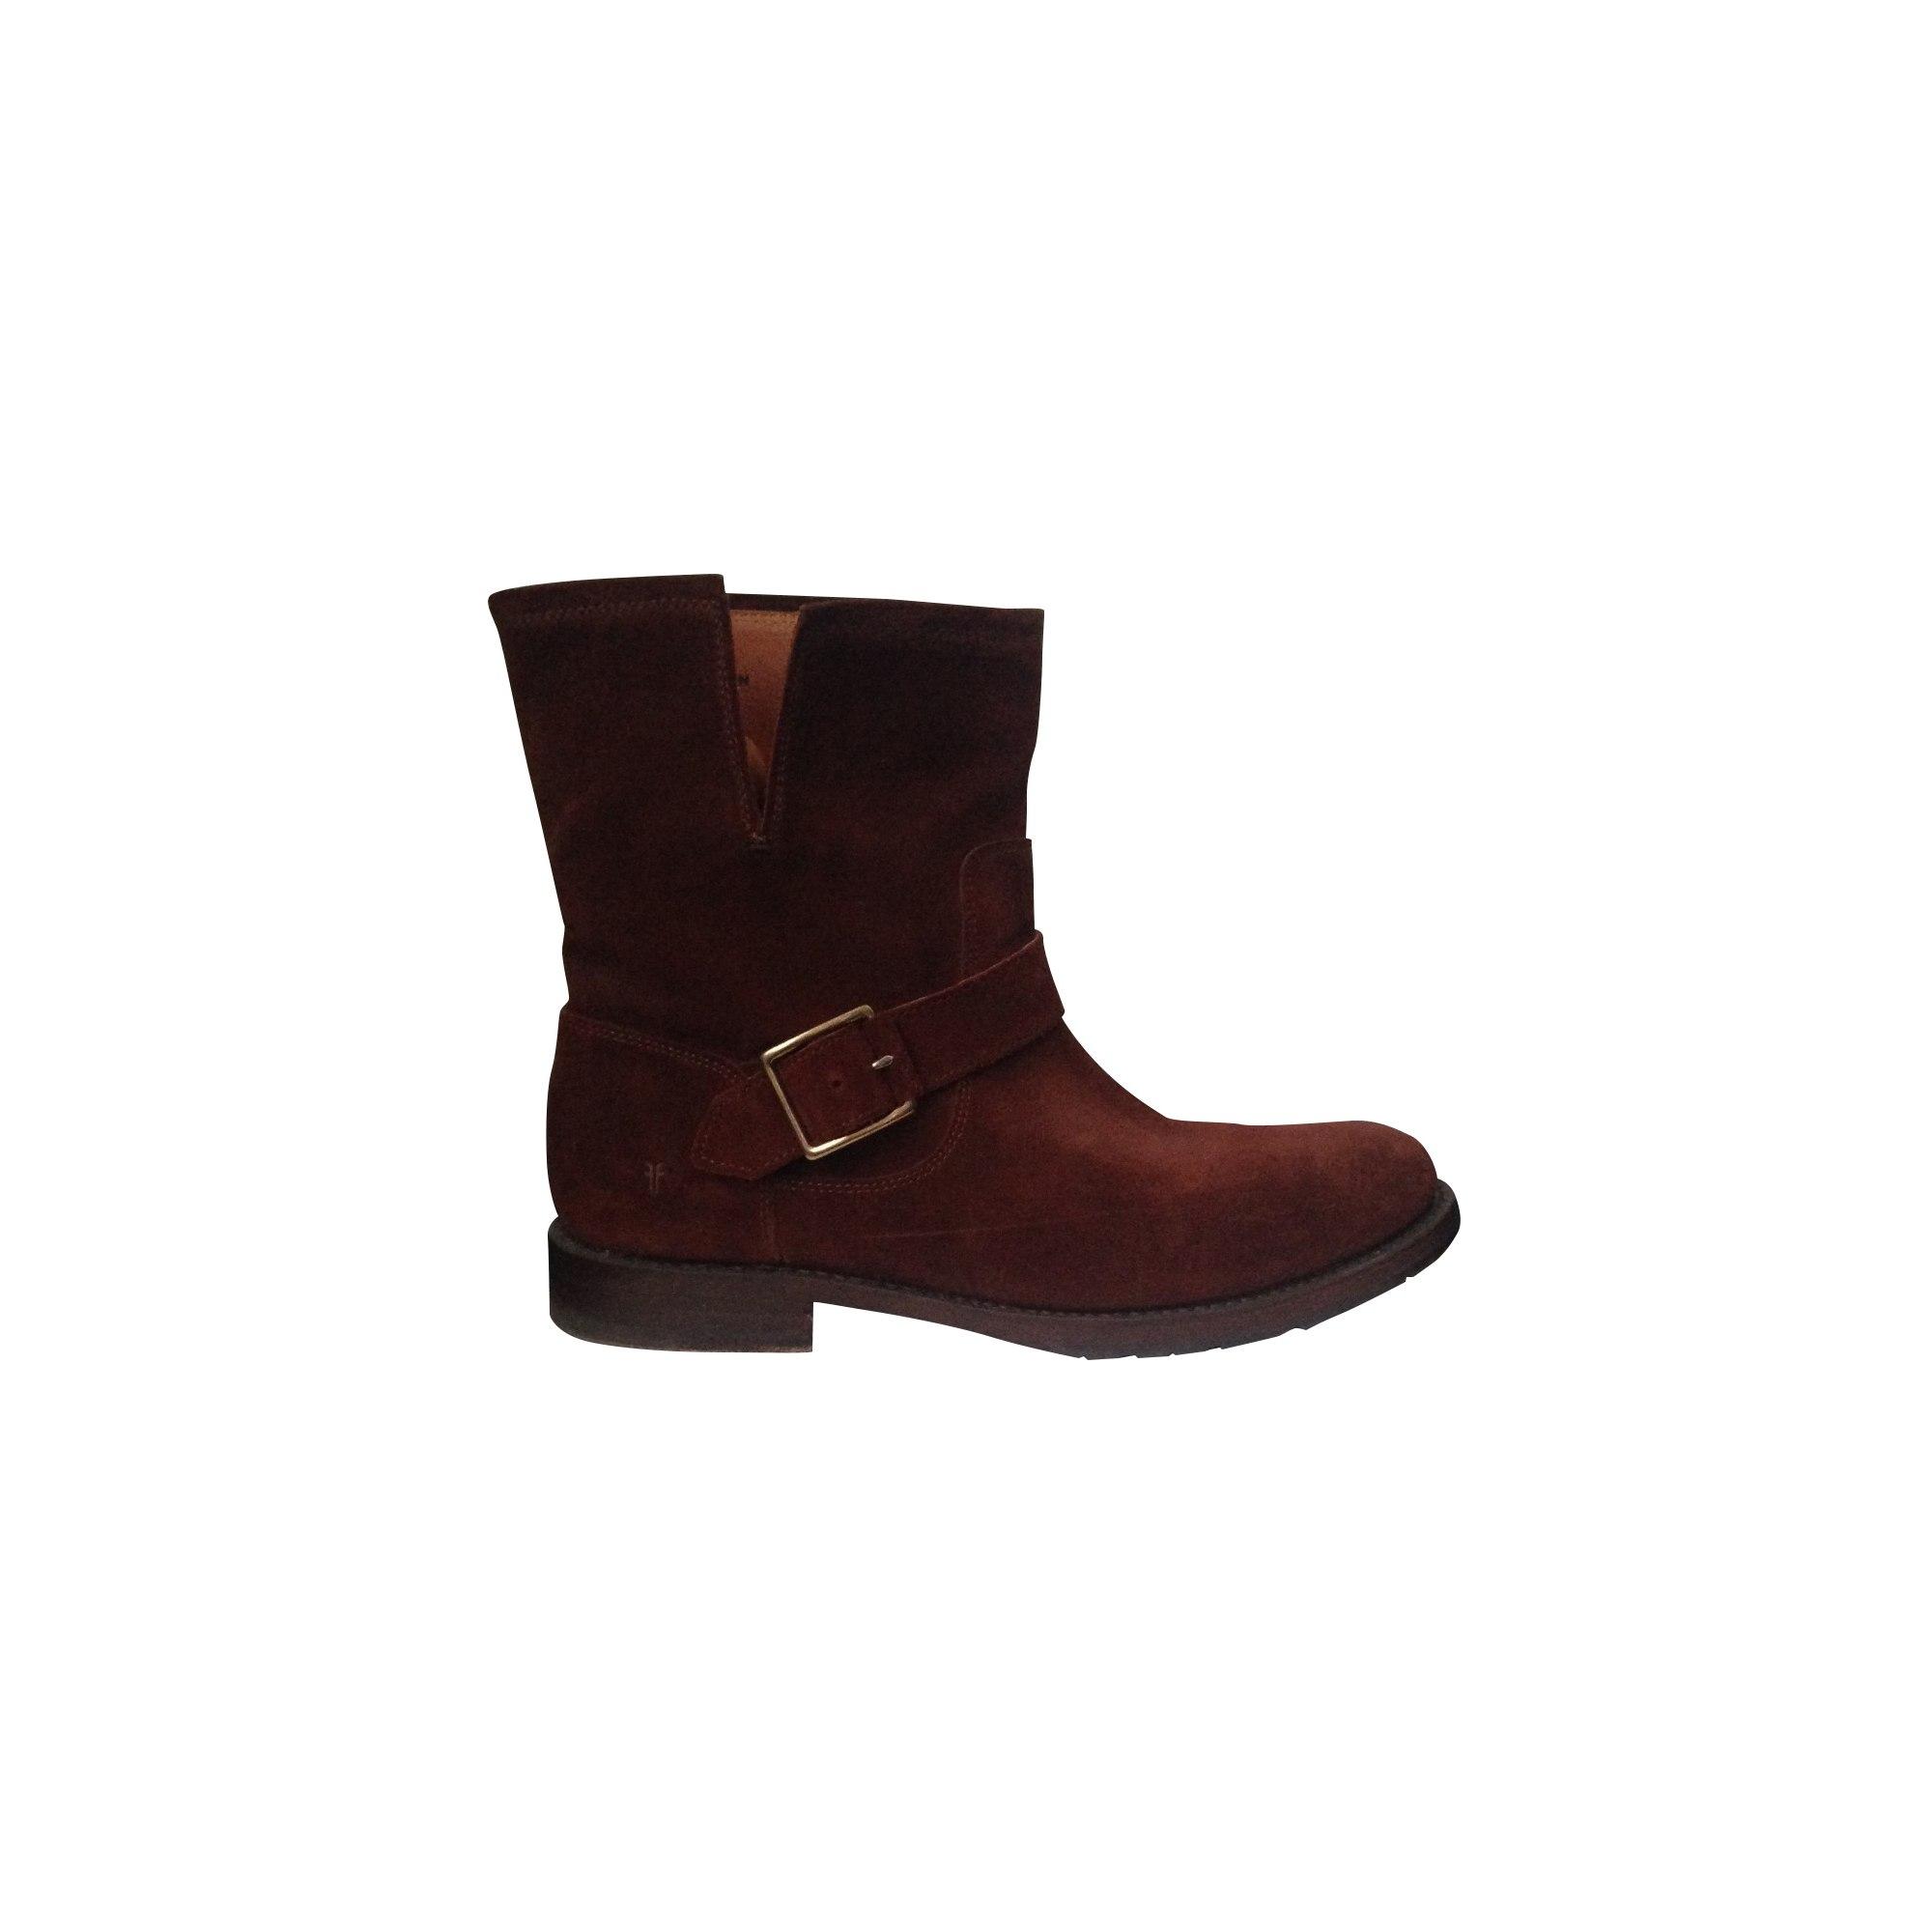 Bottines & low boots motards FRYE Marron